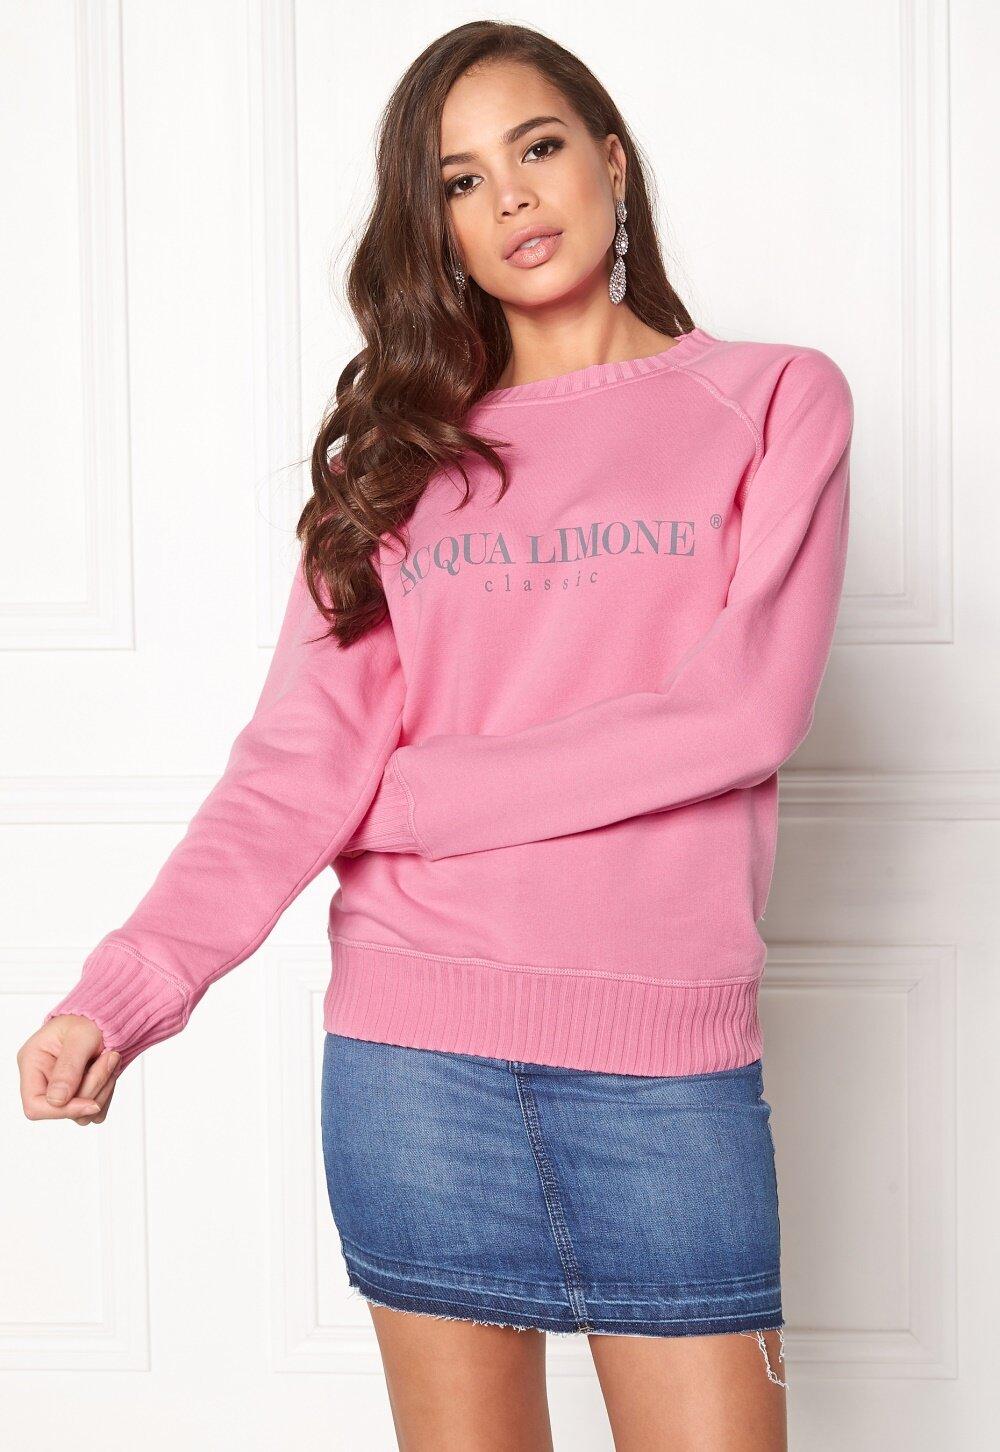 Acqua Limone Sweatshirt College Classic Rosa Sweatshirts